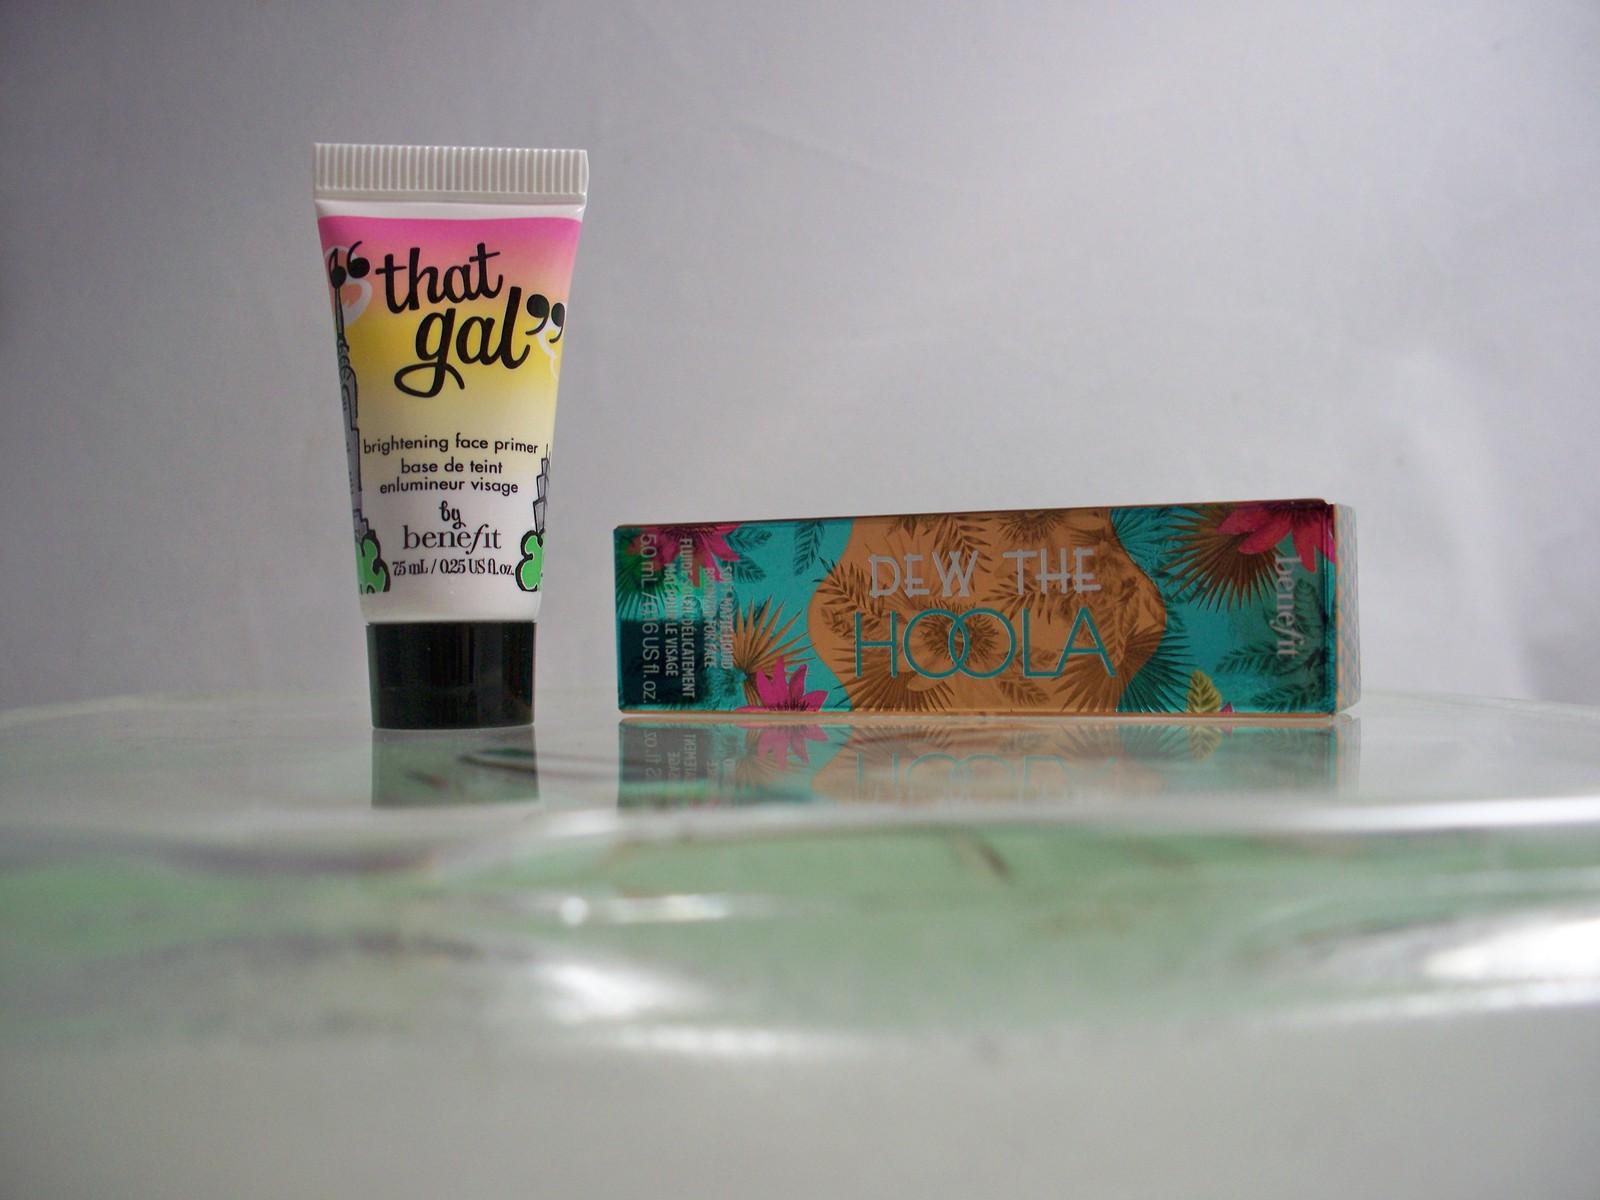 Benefit Duo Dew The Hoola Liquid Bronzer plus That Gal Primer both travel size - $16.25